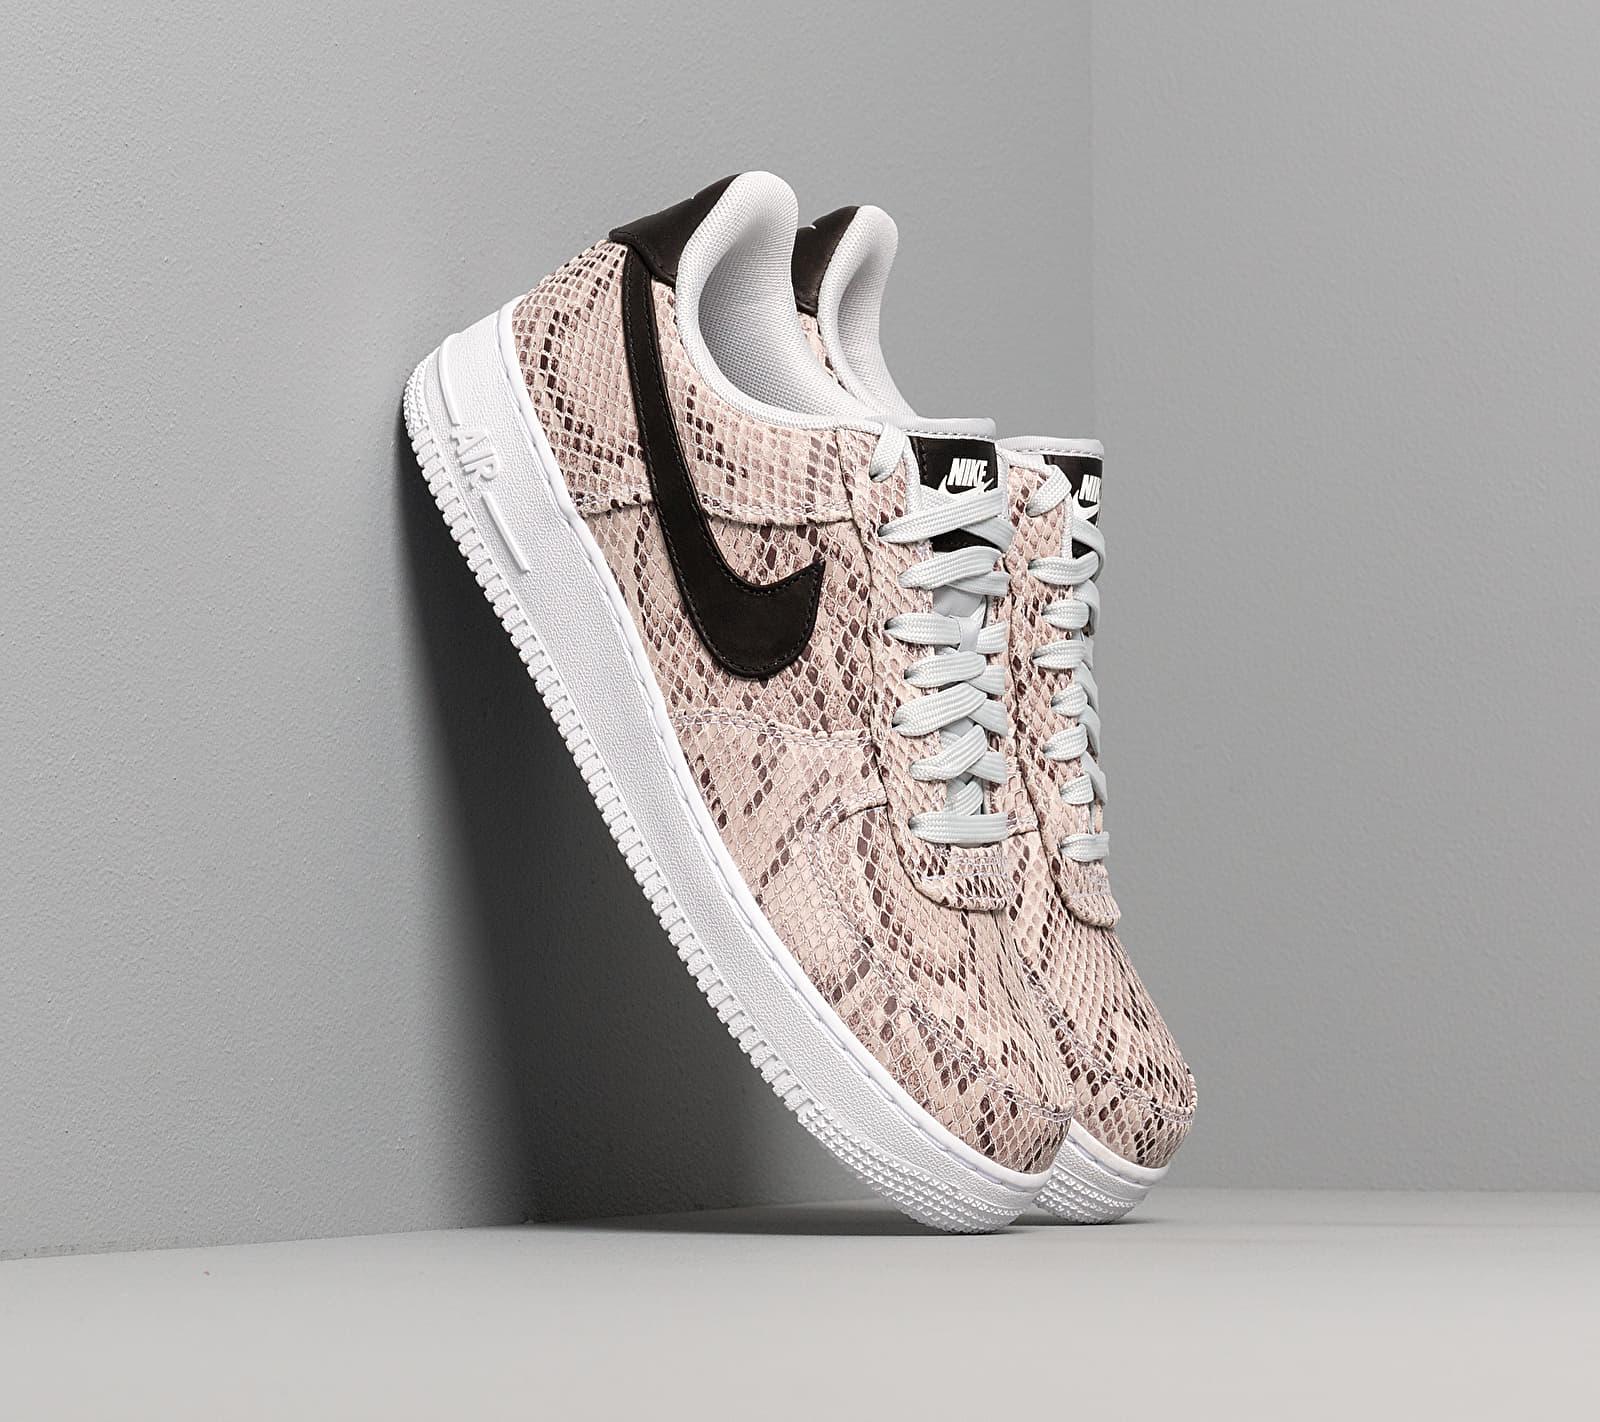 Nike Air Force 1 '07 Premium White/ Black-Pure Platinum EUR 44.5